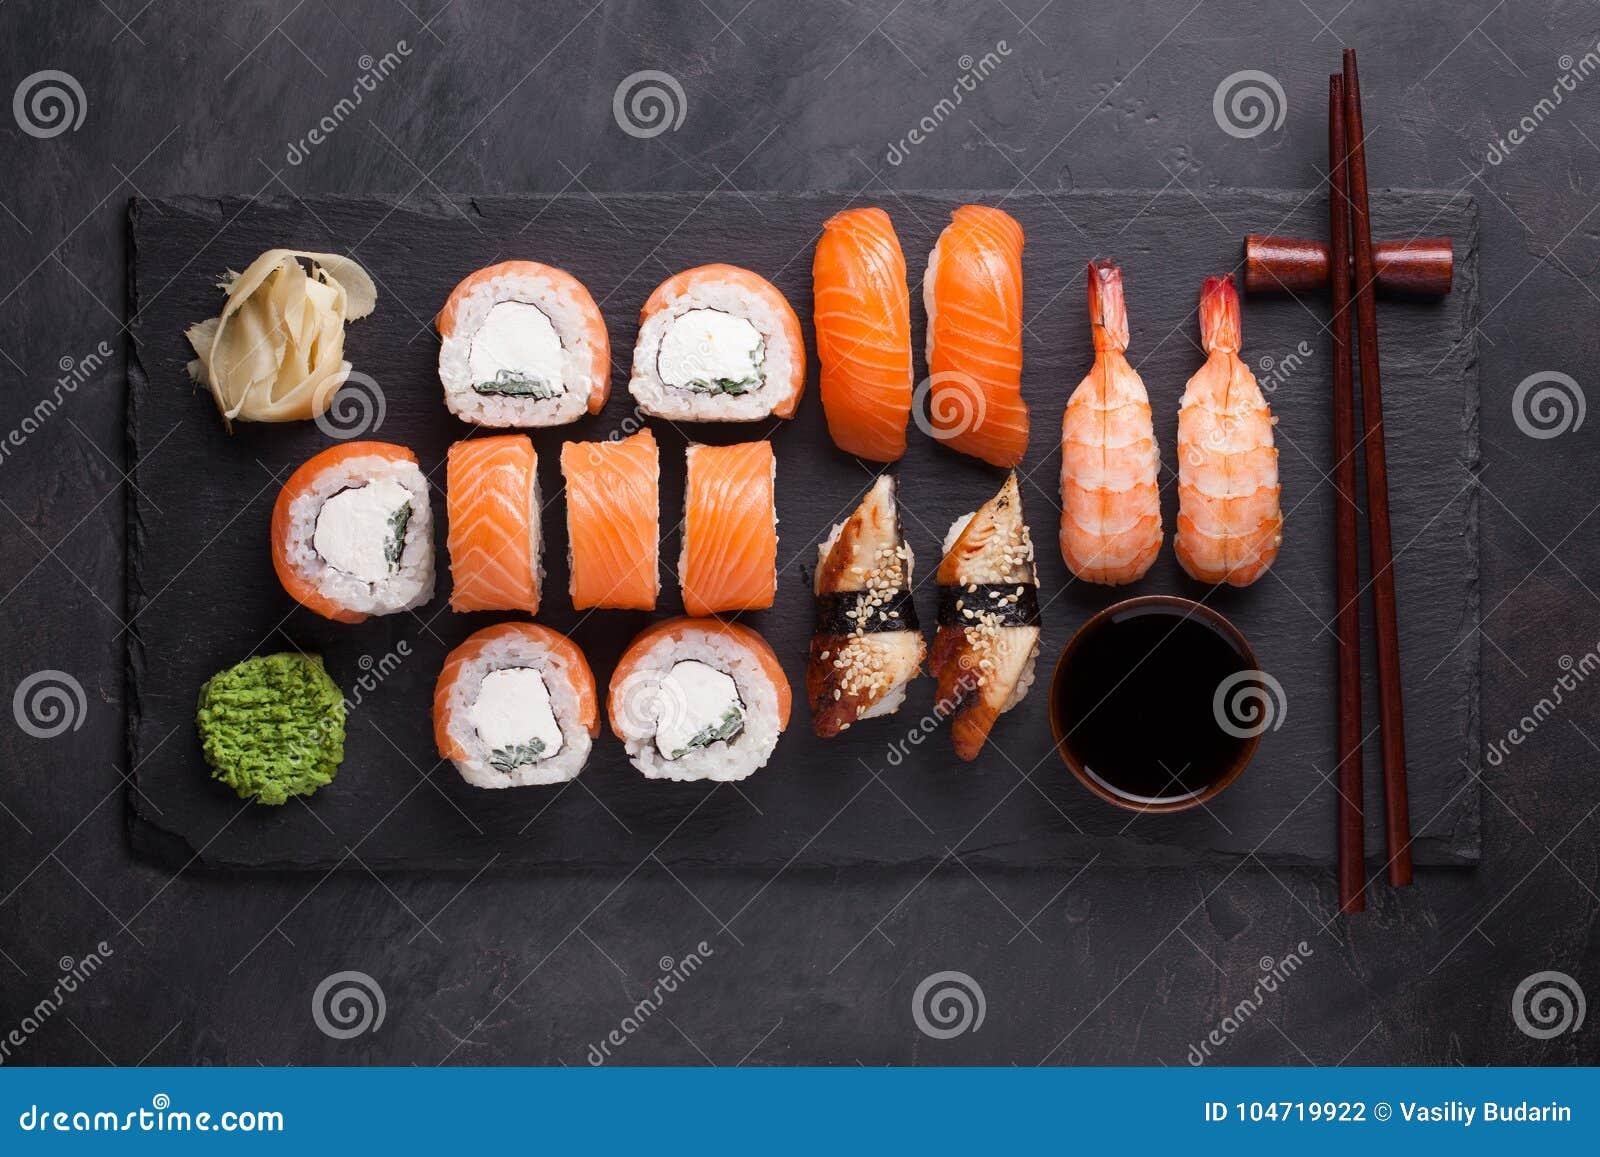 Sushi Set sashimi with salmon, shrimp, eel and sushi rolls philadelphia served on stone slate. Top view